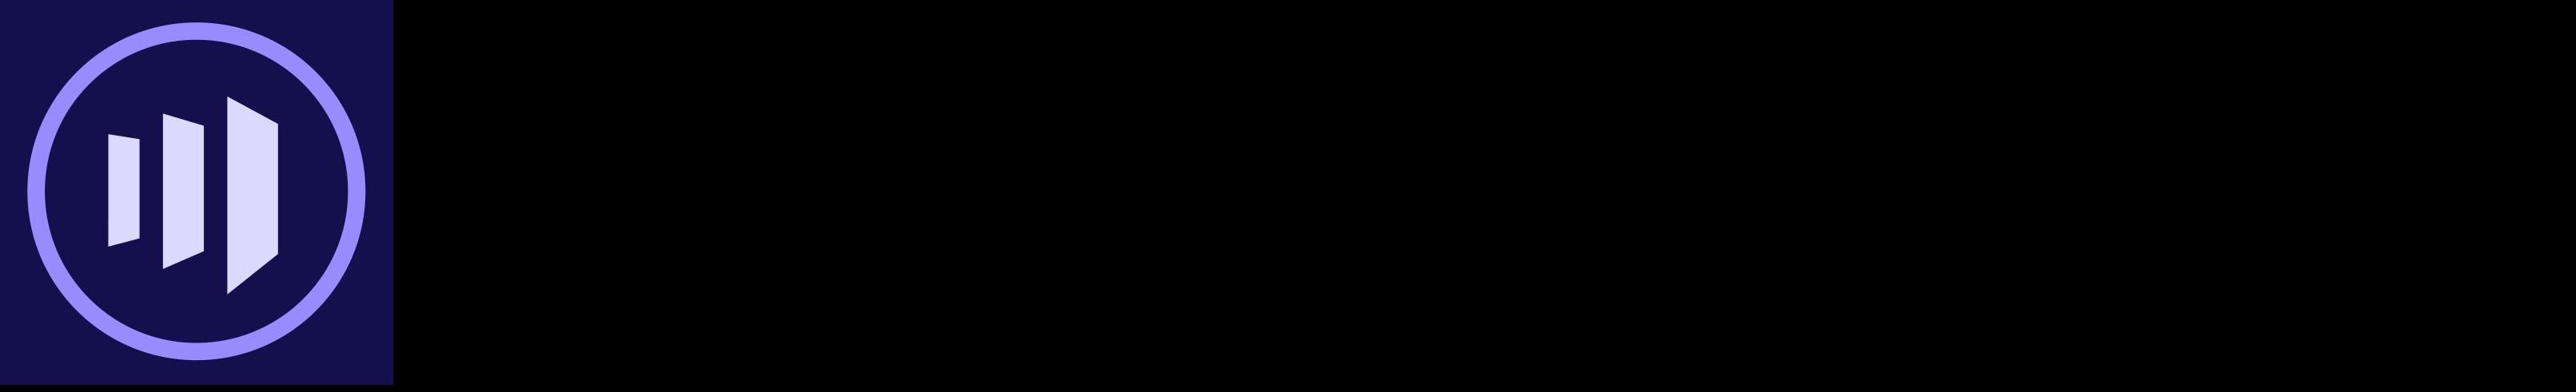 Adobe Marketo Engage logo